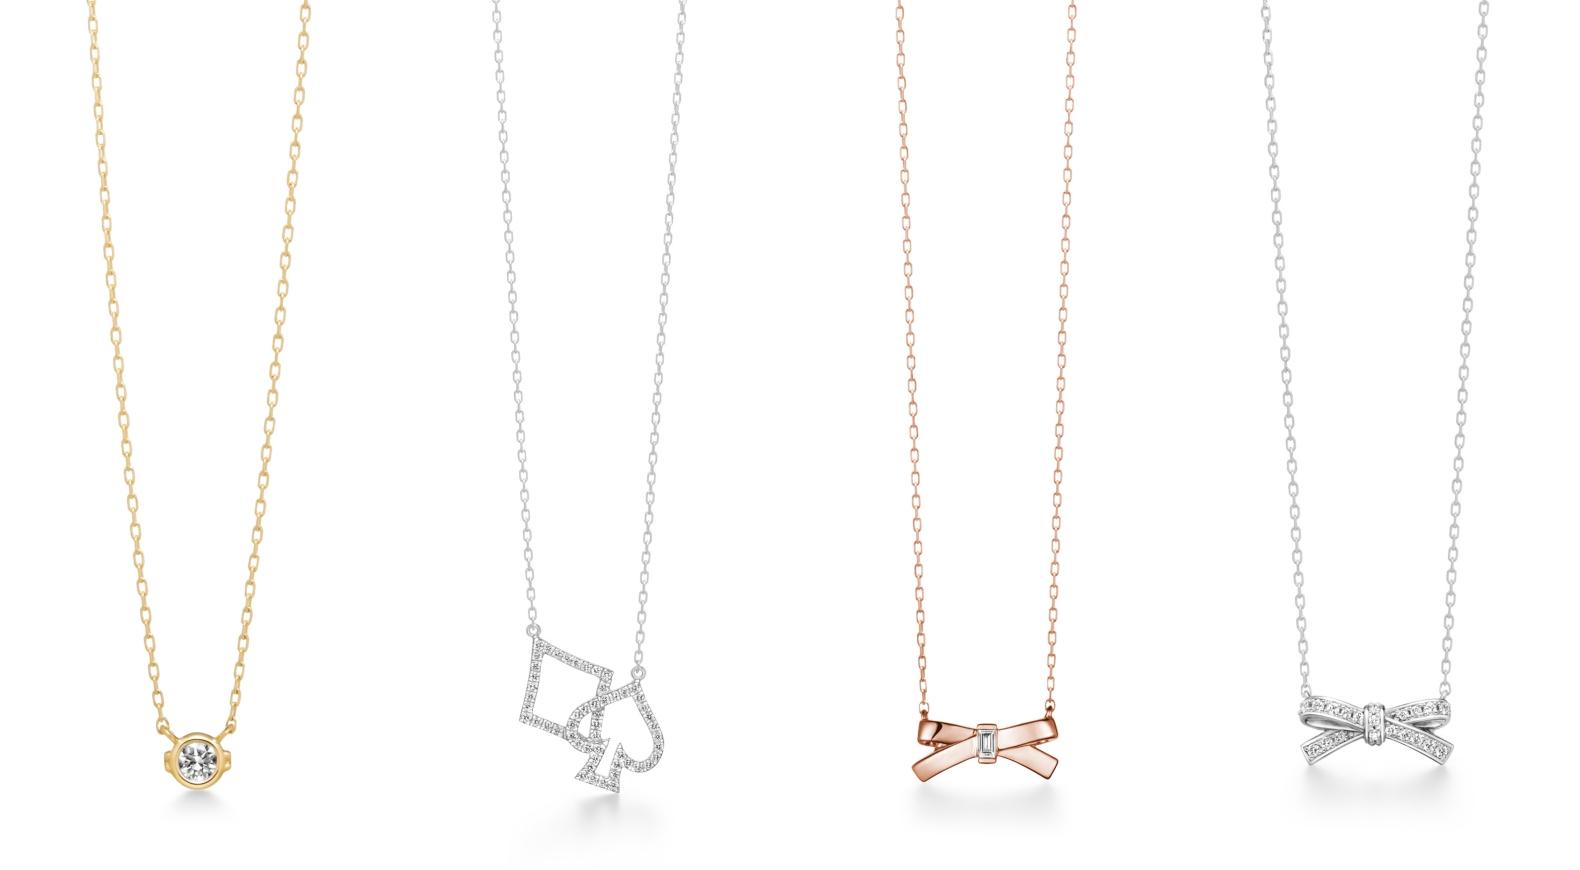 AHKAK lierre heart項鍊NT.12,700、AHKAK march diamond (方塊與黑桃)項鍊NT.43,600、AHKAK petit ruban rose項鍊NT.16,400、AHKAK ruban diamond項鍊NT.33,500